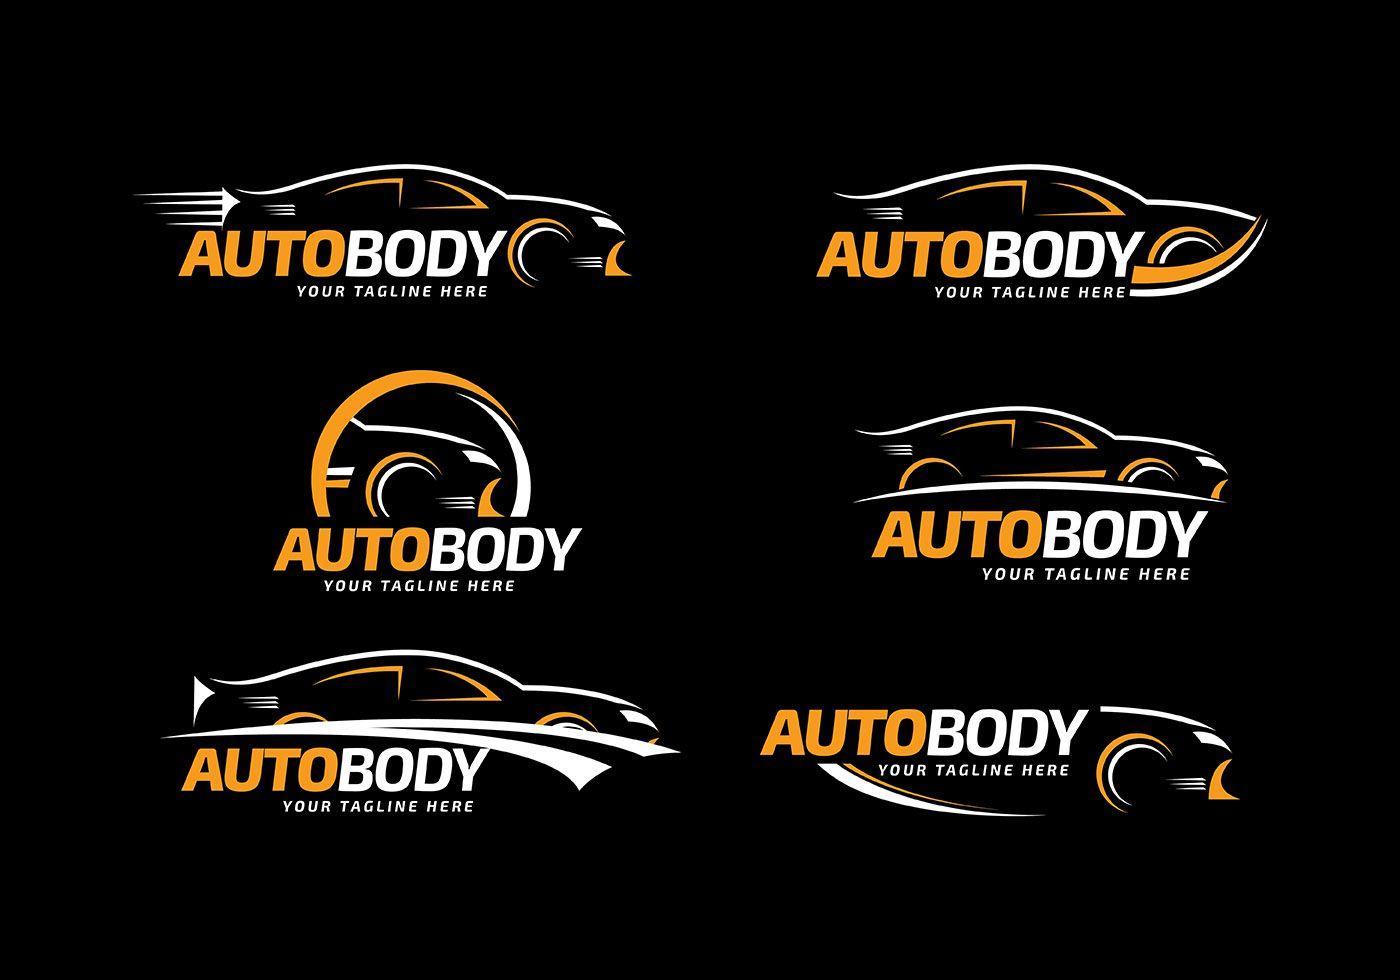 Collection car auto body logo template set of modern car